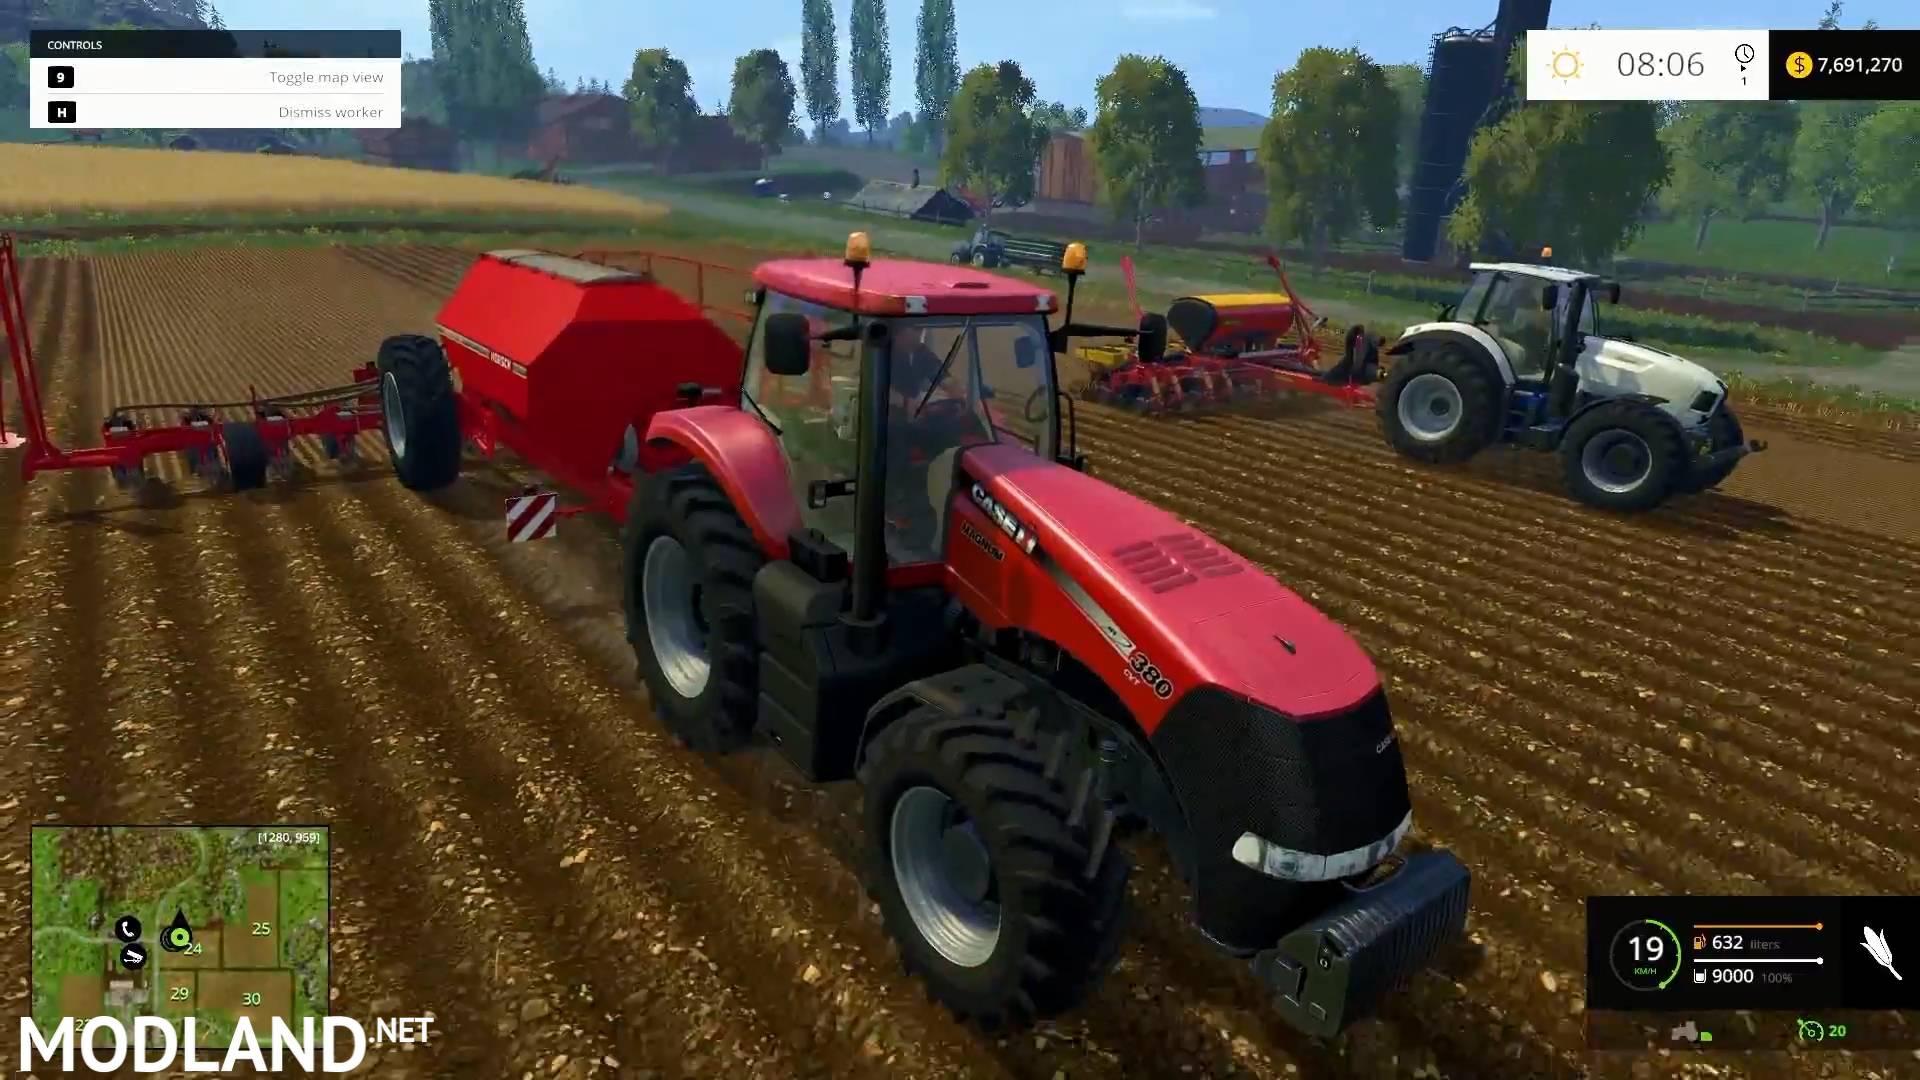 Farming Simulator 15 image #1